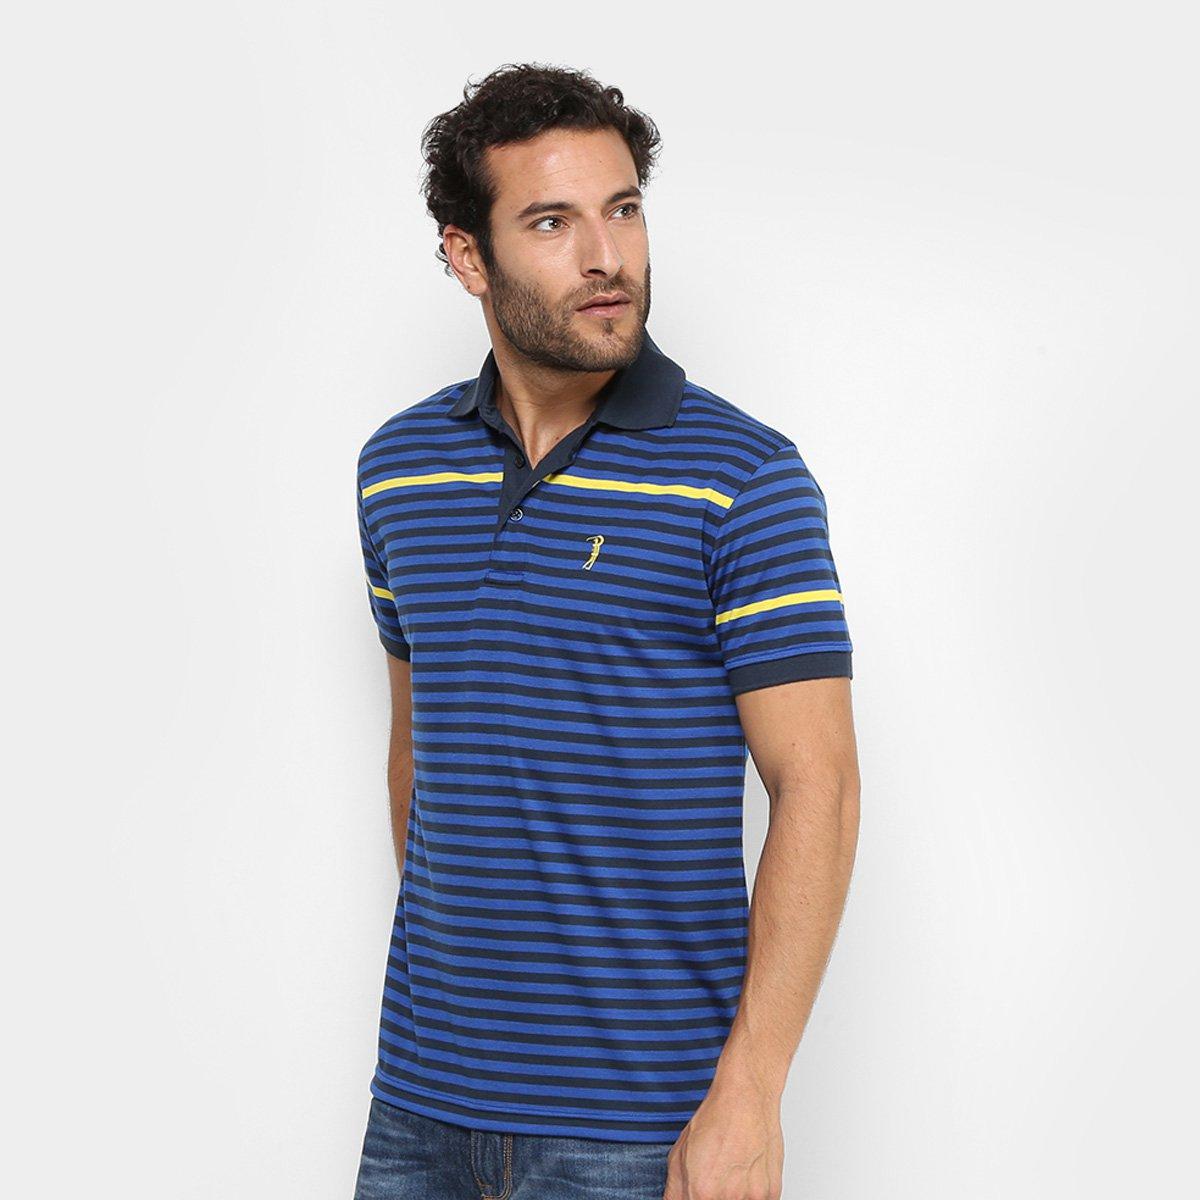 Camisa Polo Aleatory Malha Listras Masculina - Compre Agora  8a3e646d1d1e5